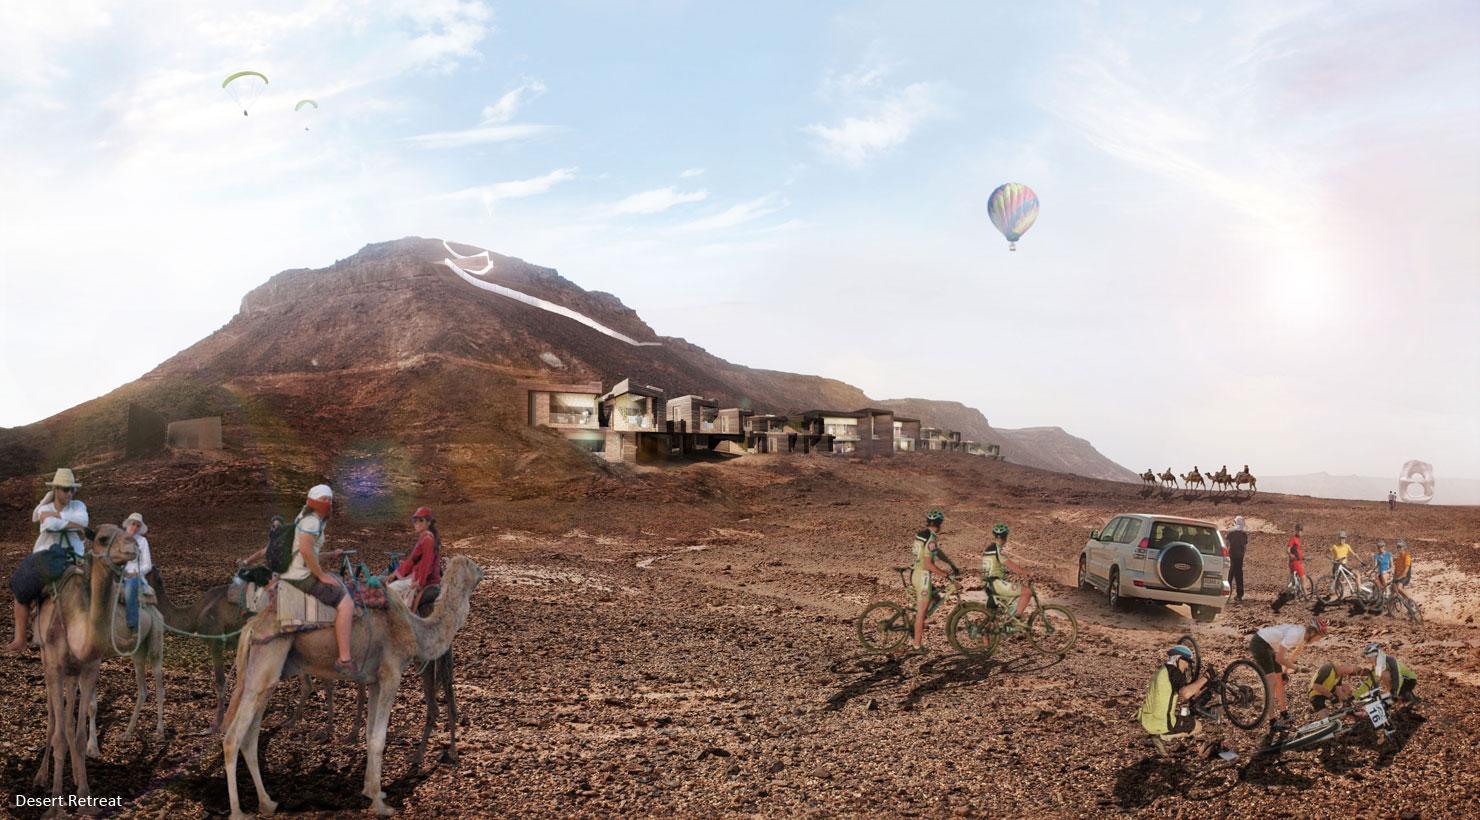 Desert retreat